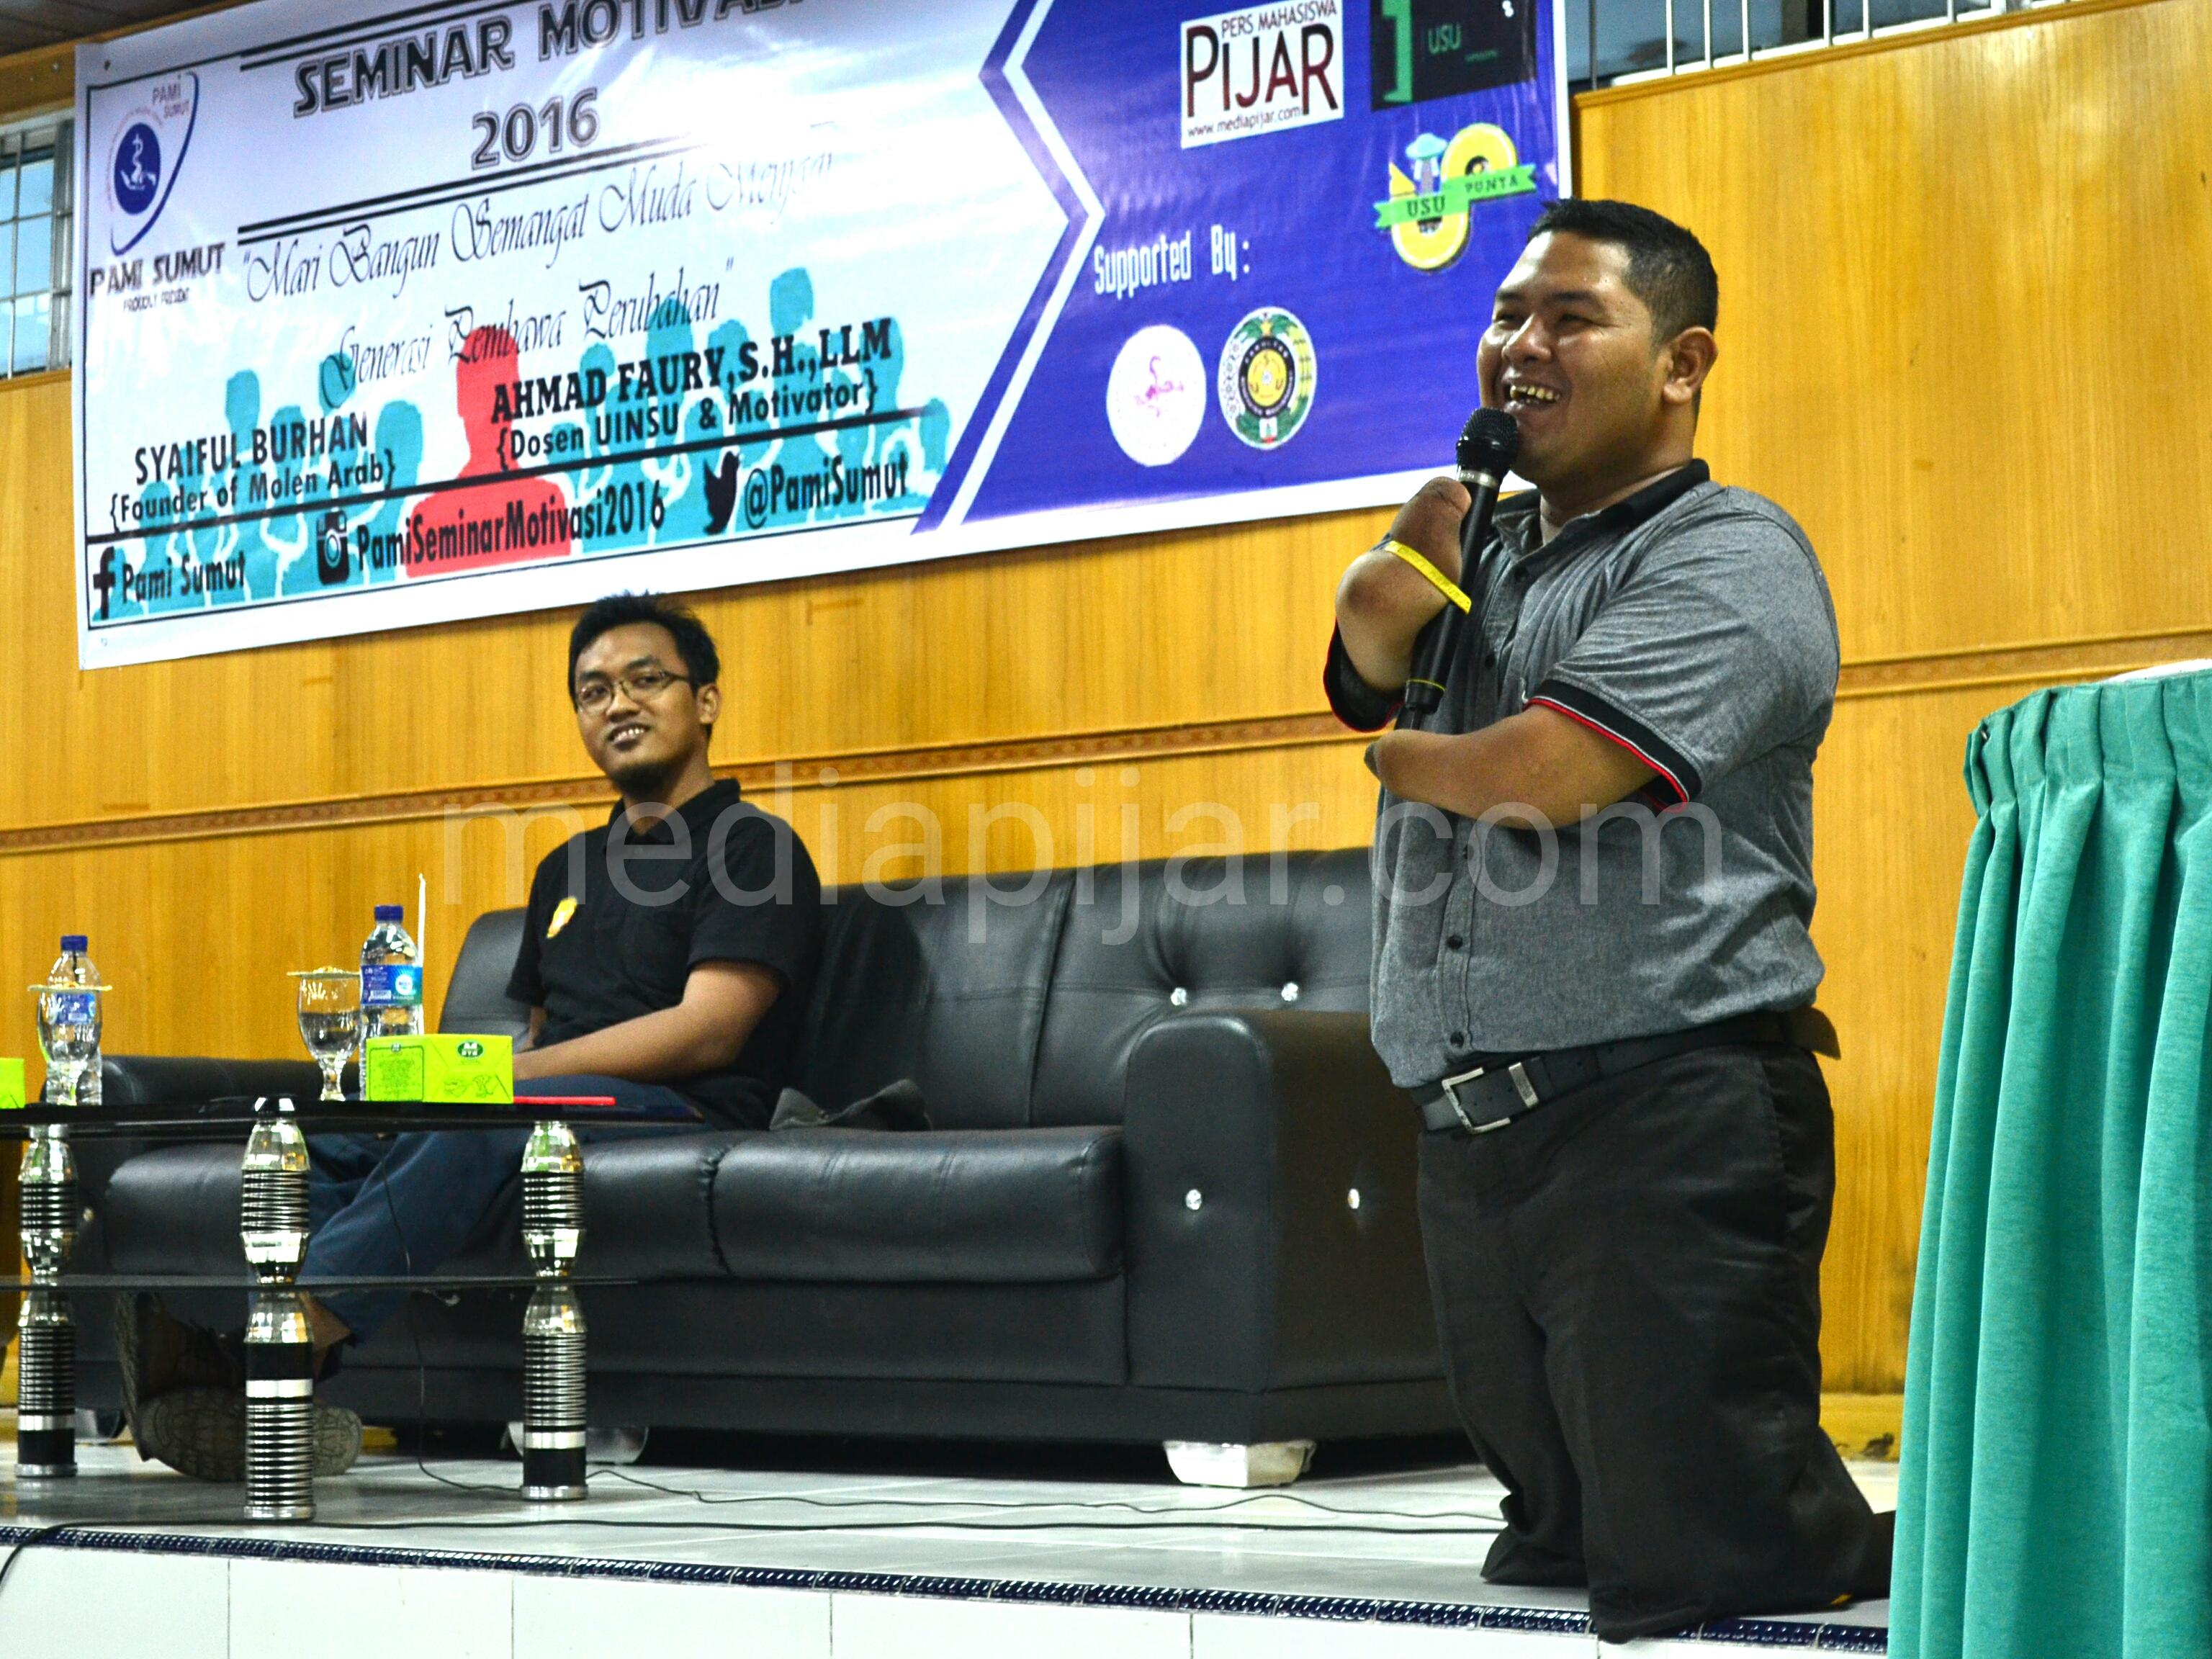 Ahmad Faury (Kanan) dan Syaiful Burhan ( Kiri) sebagai pembicara dalam kegiatan Seminar Motivasi 2016 PAMI SUMUT di Aula FKM USU, Medan. (04/06). Fotografer Reza Andika Putra.